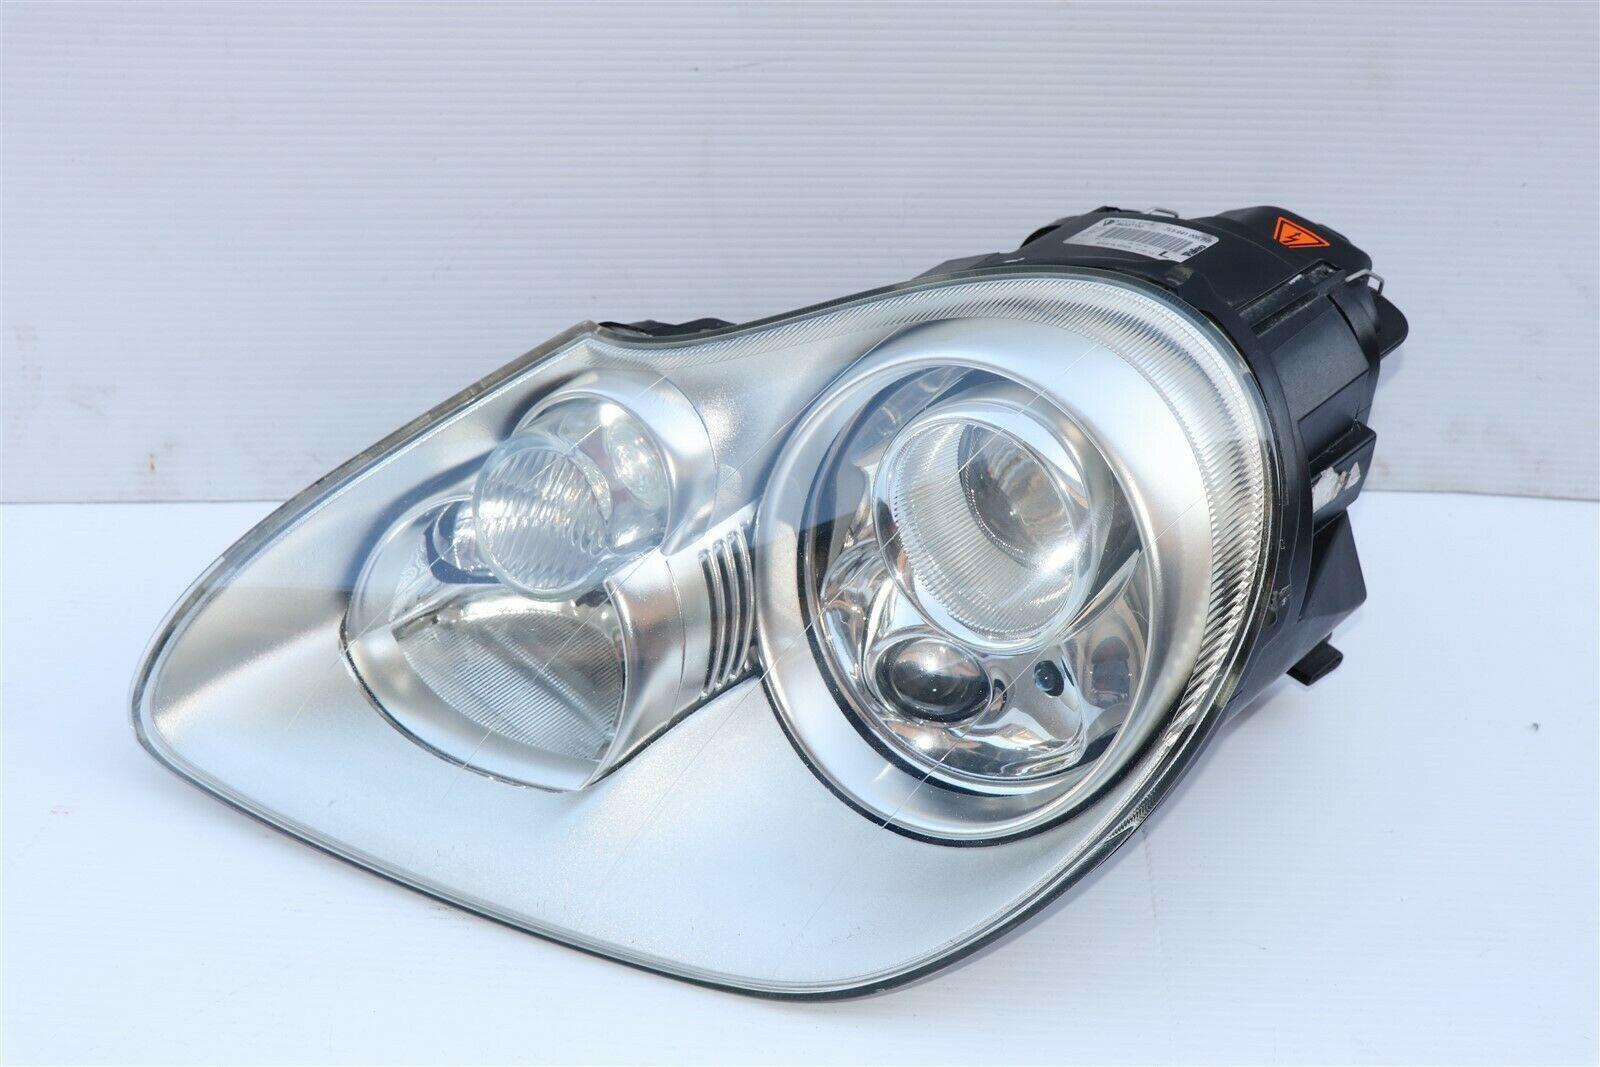 03-06 Porsche 955 Cayenne S Turbo Headlight Xenon HID Driver Left - LH POLISHED